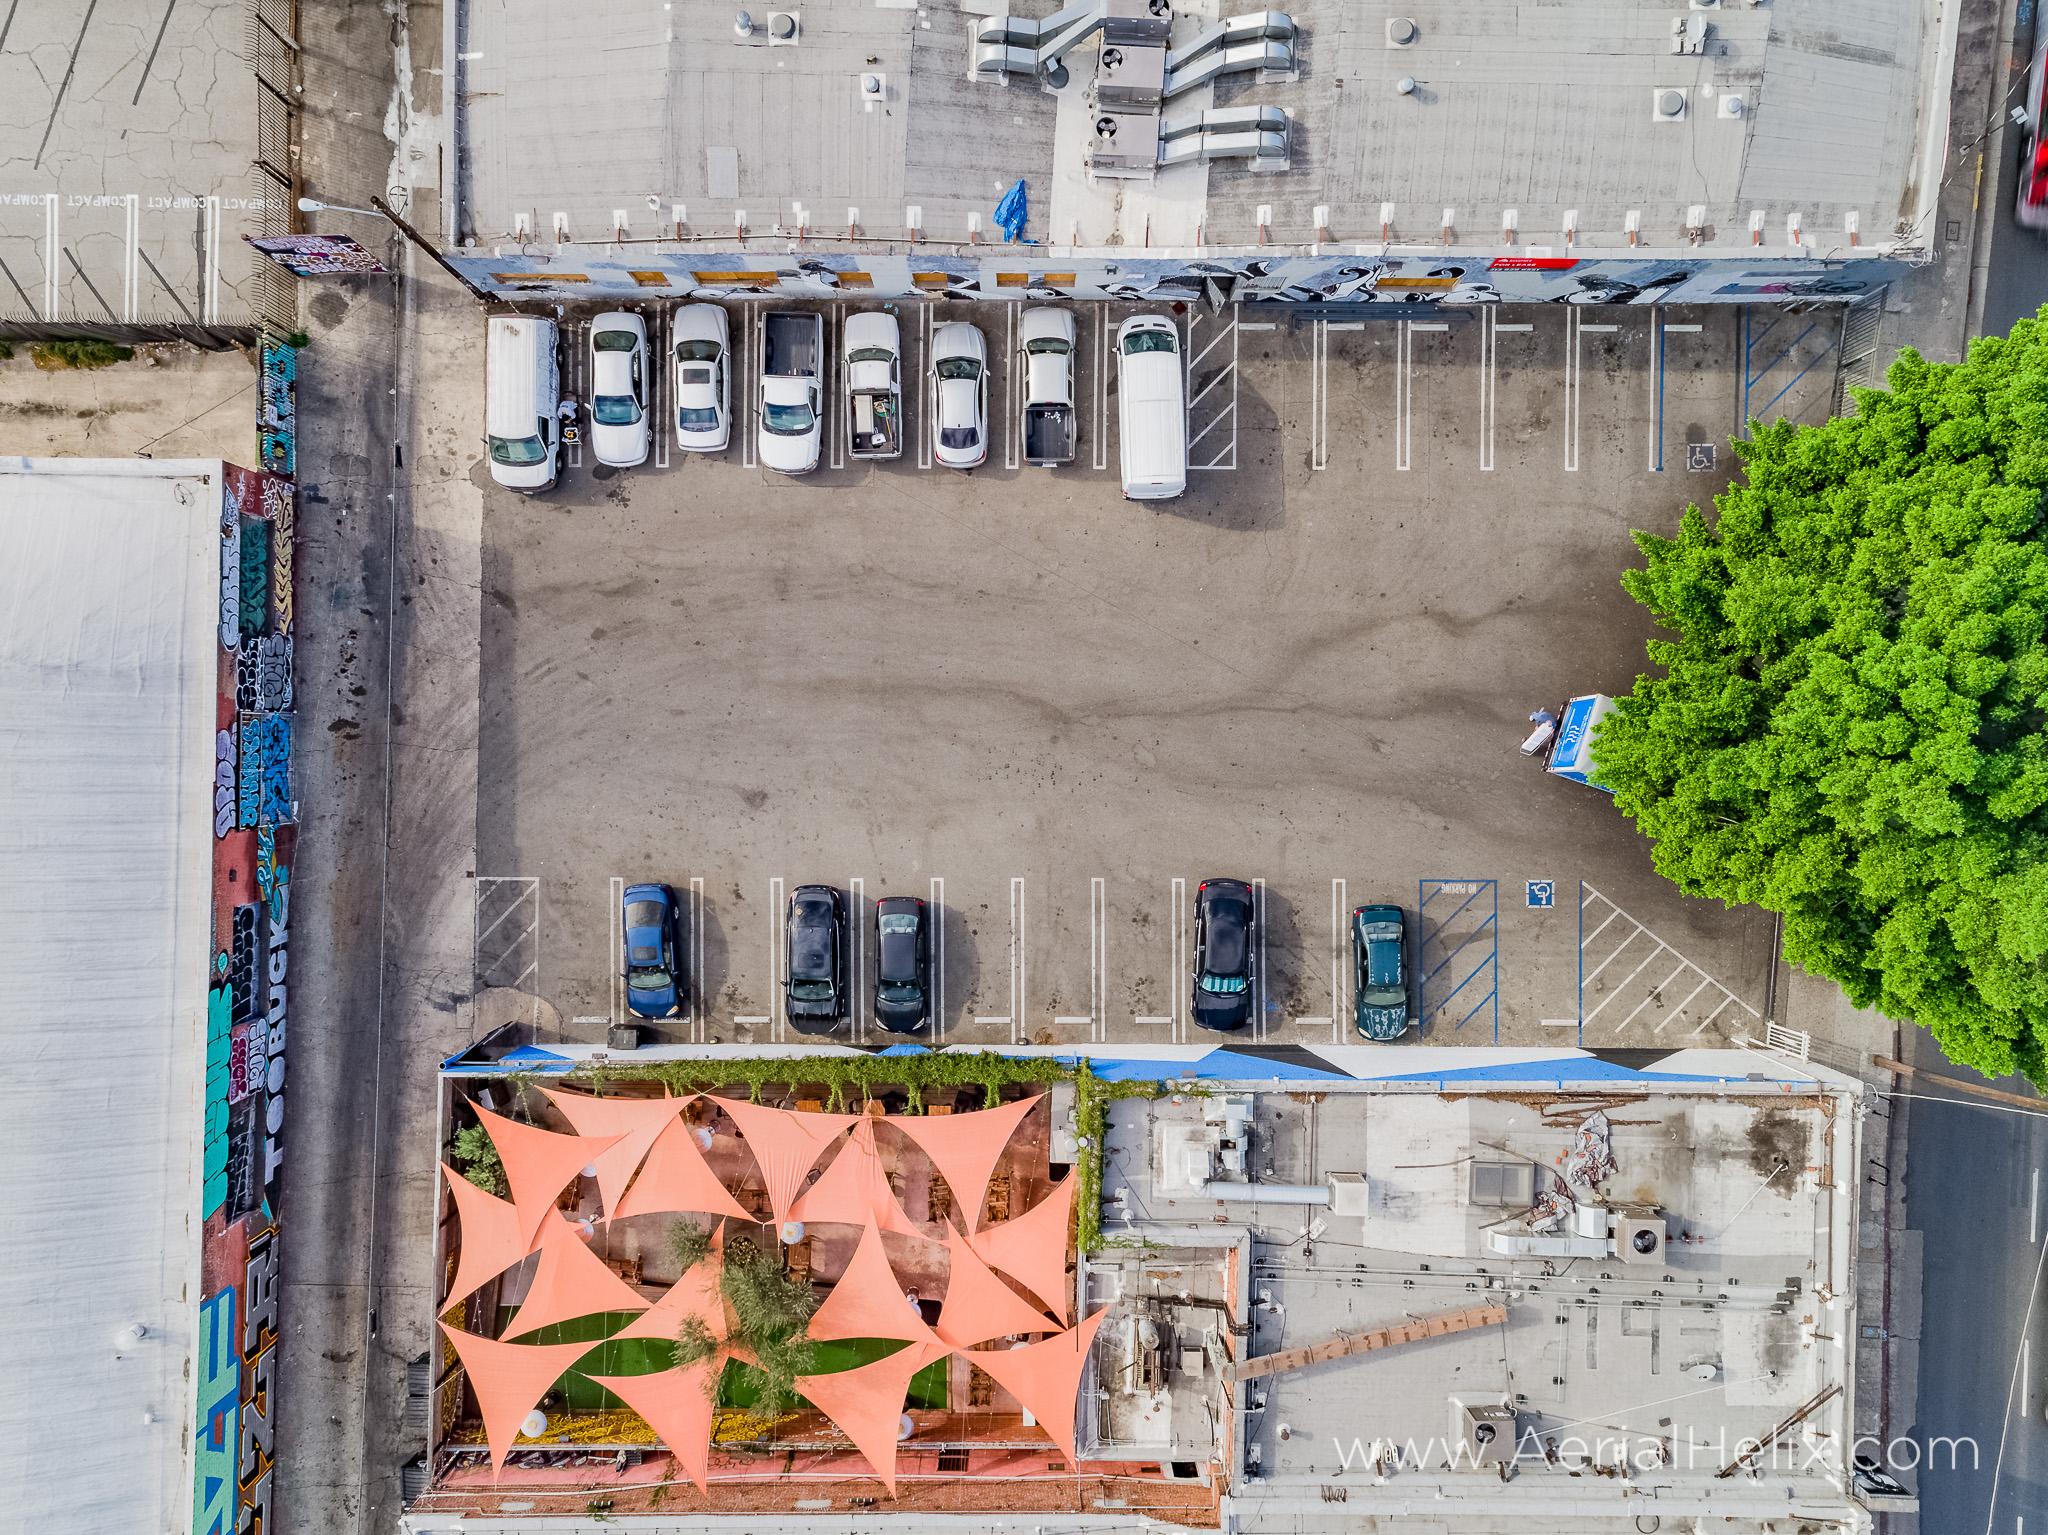 Perfect Parking 2 aerial photographer-43.jpg